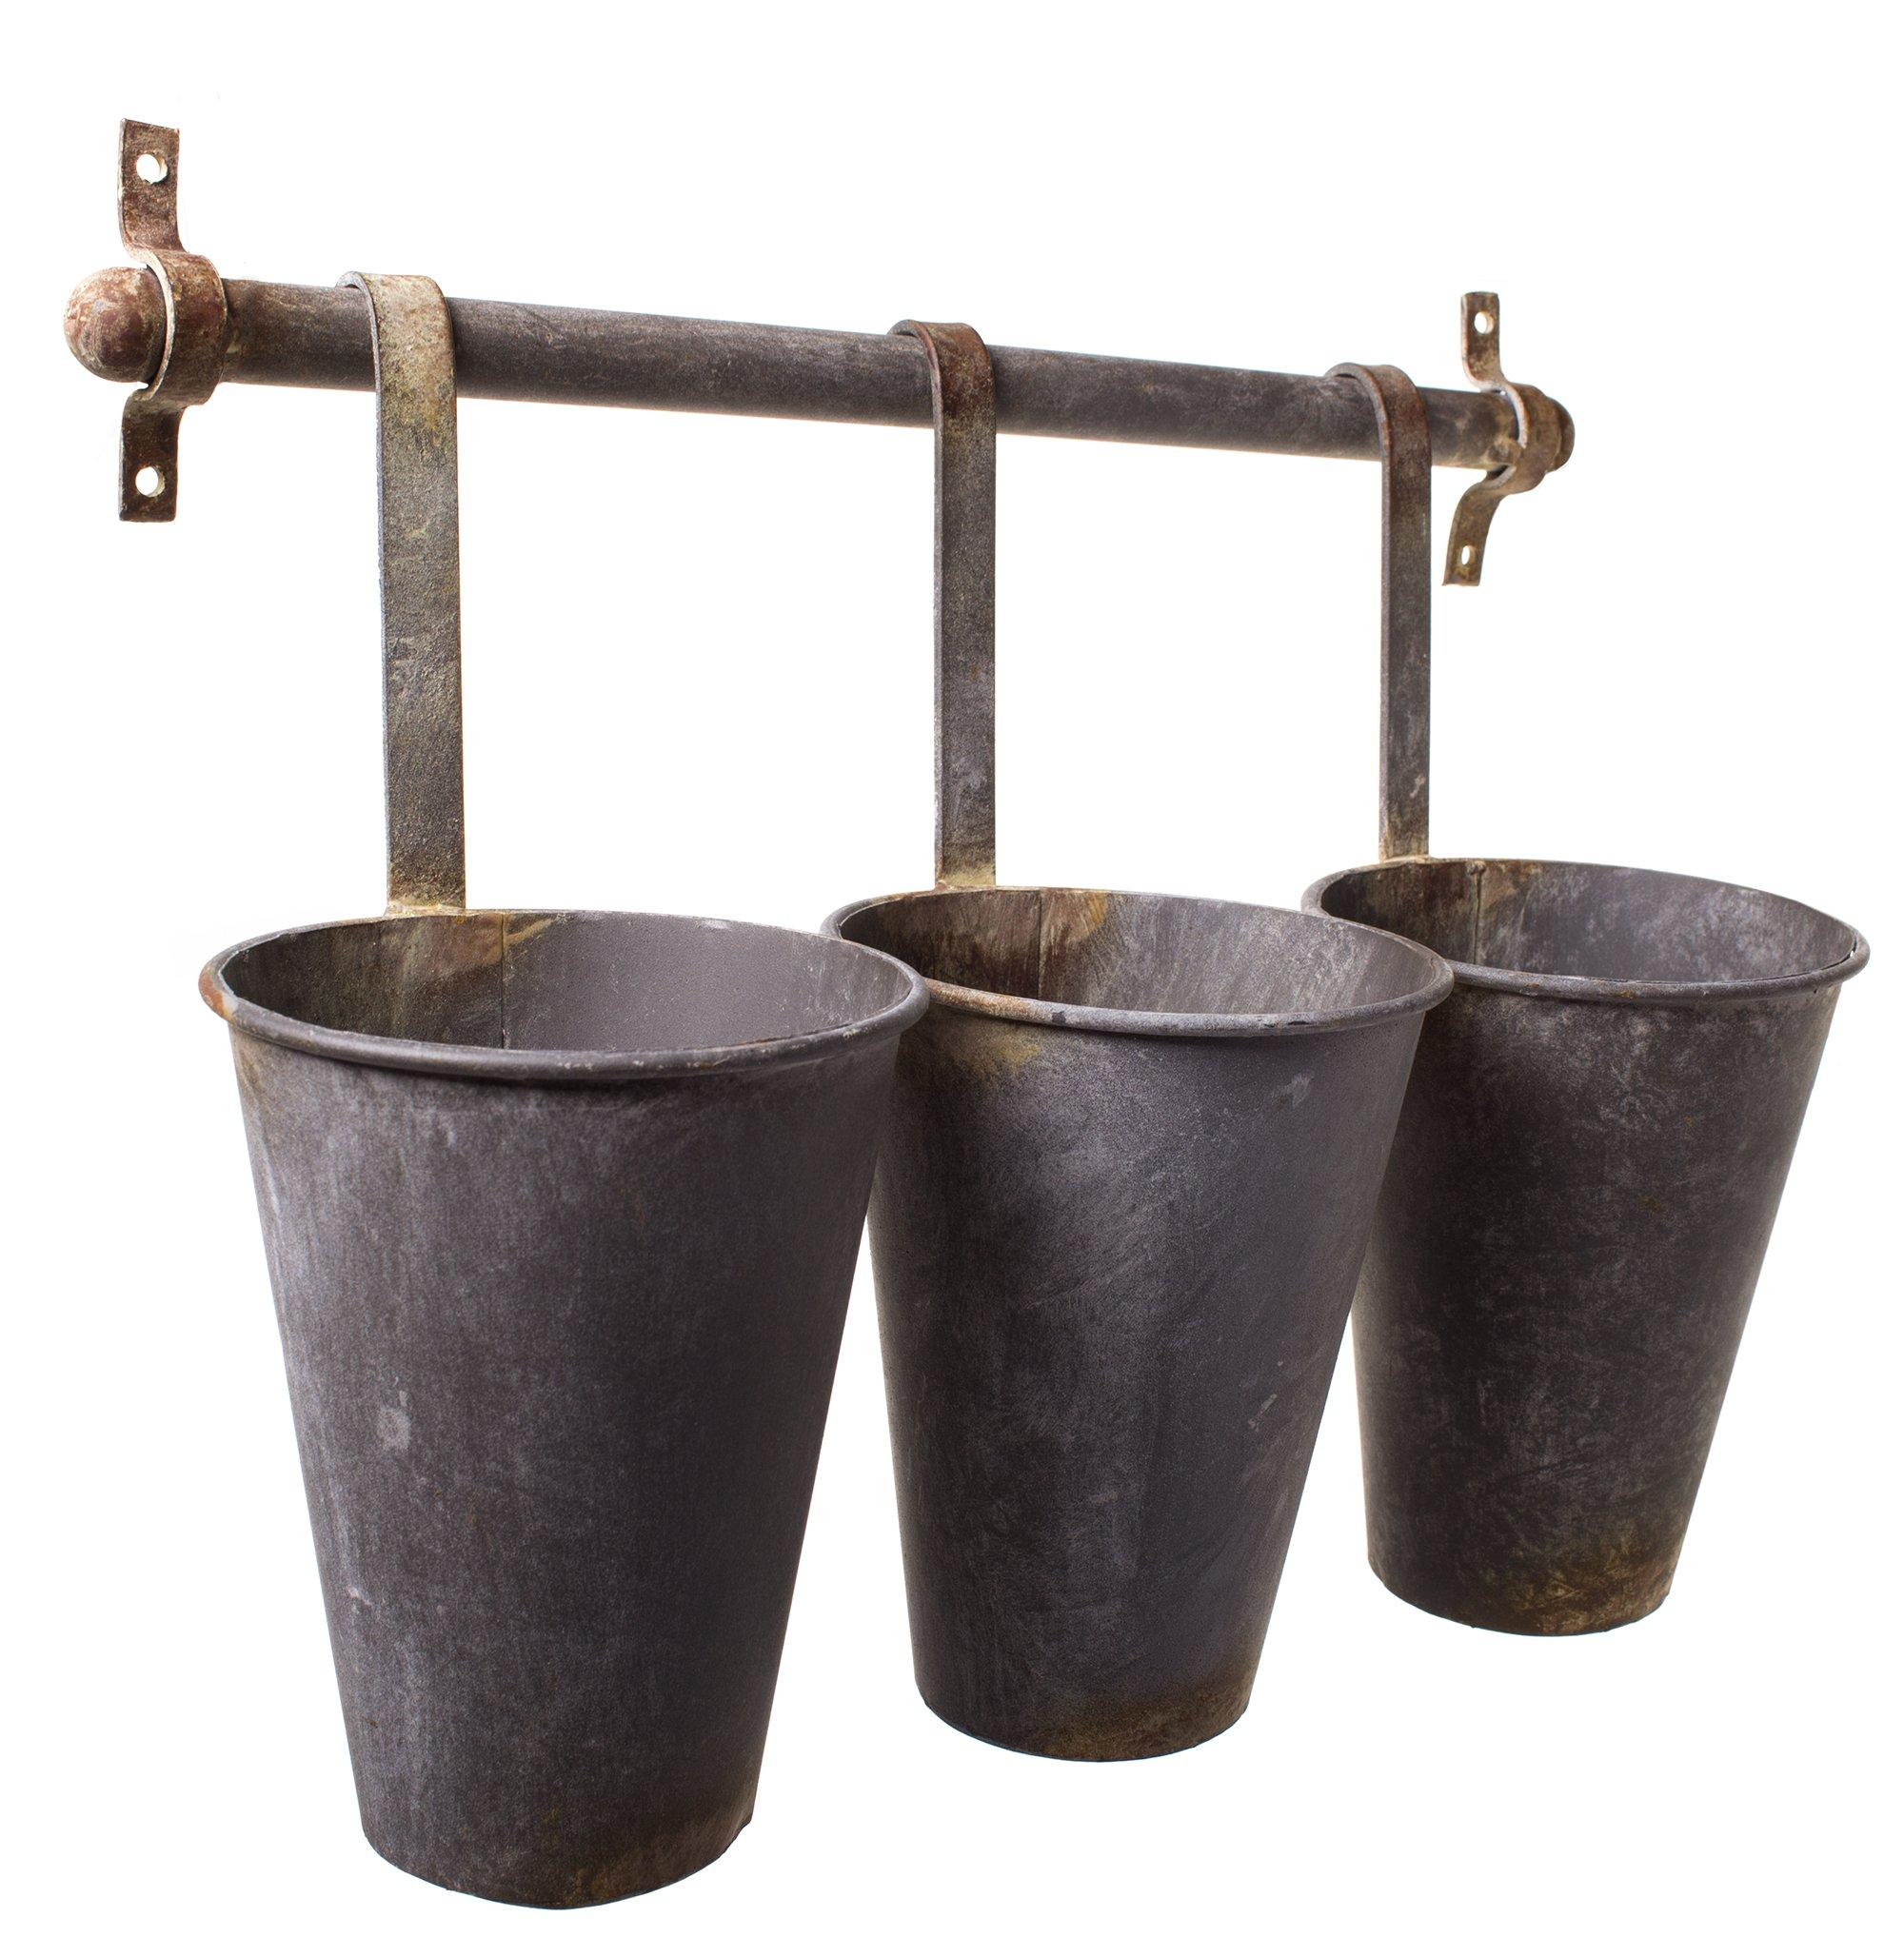 Rustic Tin Pots Galvanized 3 Hanging Wall Flower Holder Planter Pot Vase Cup Baskets Set on a Rack